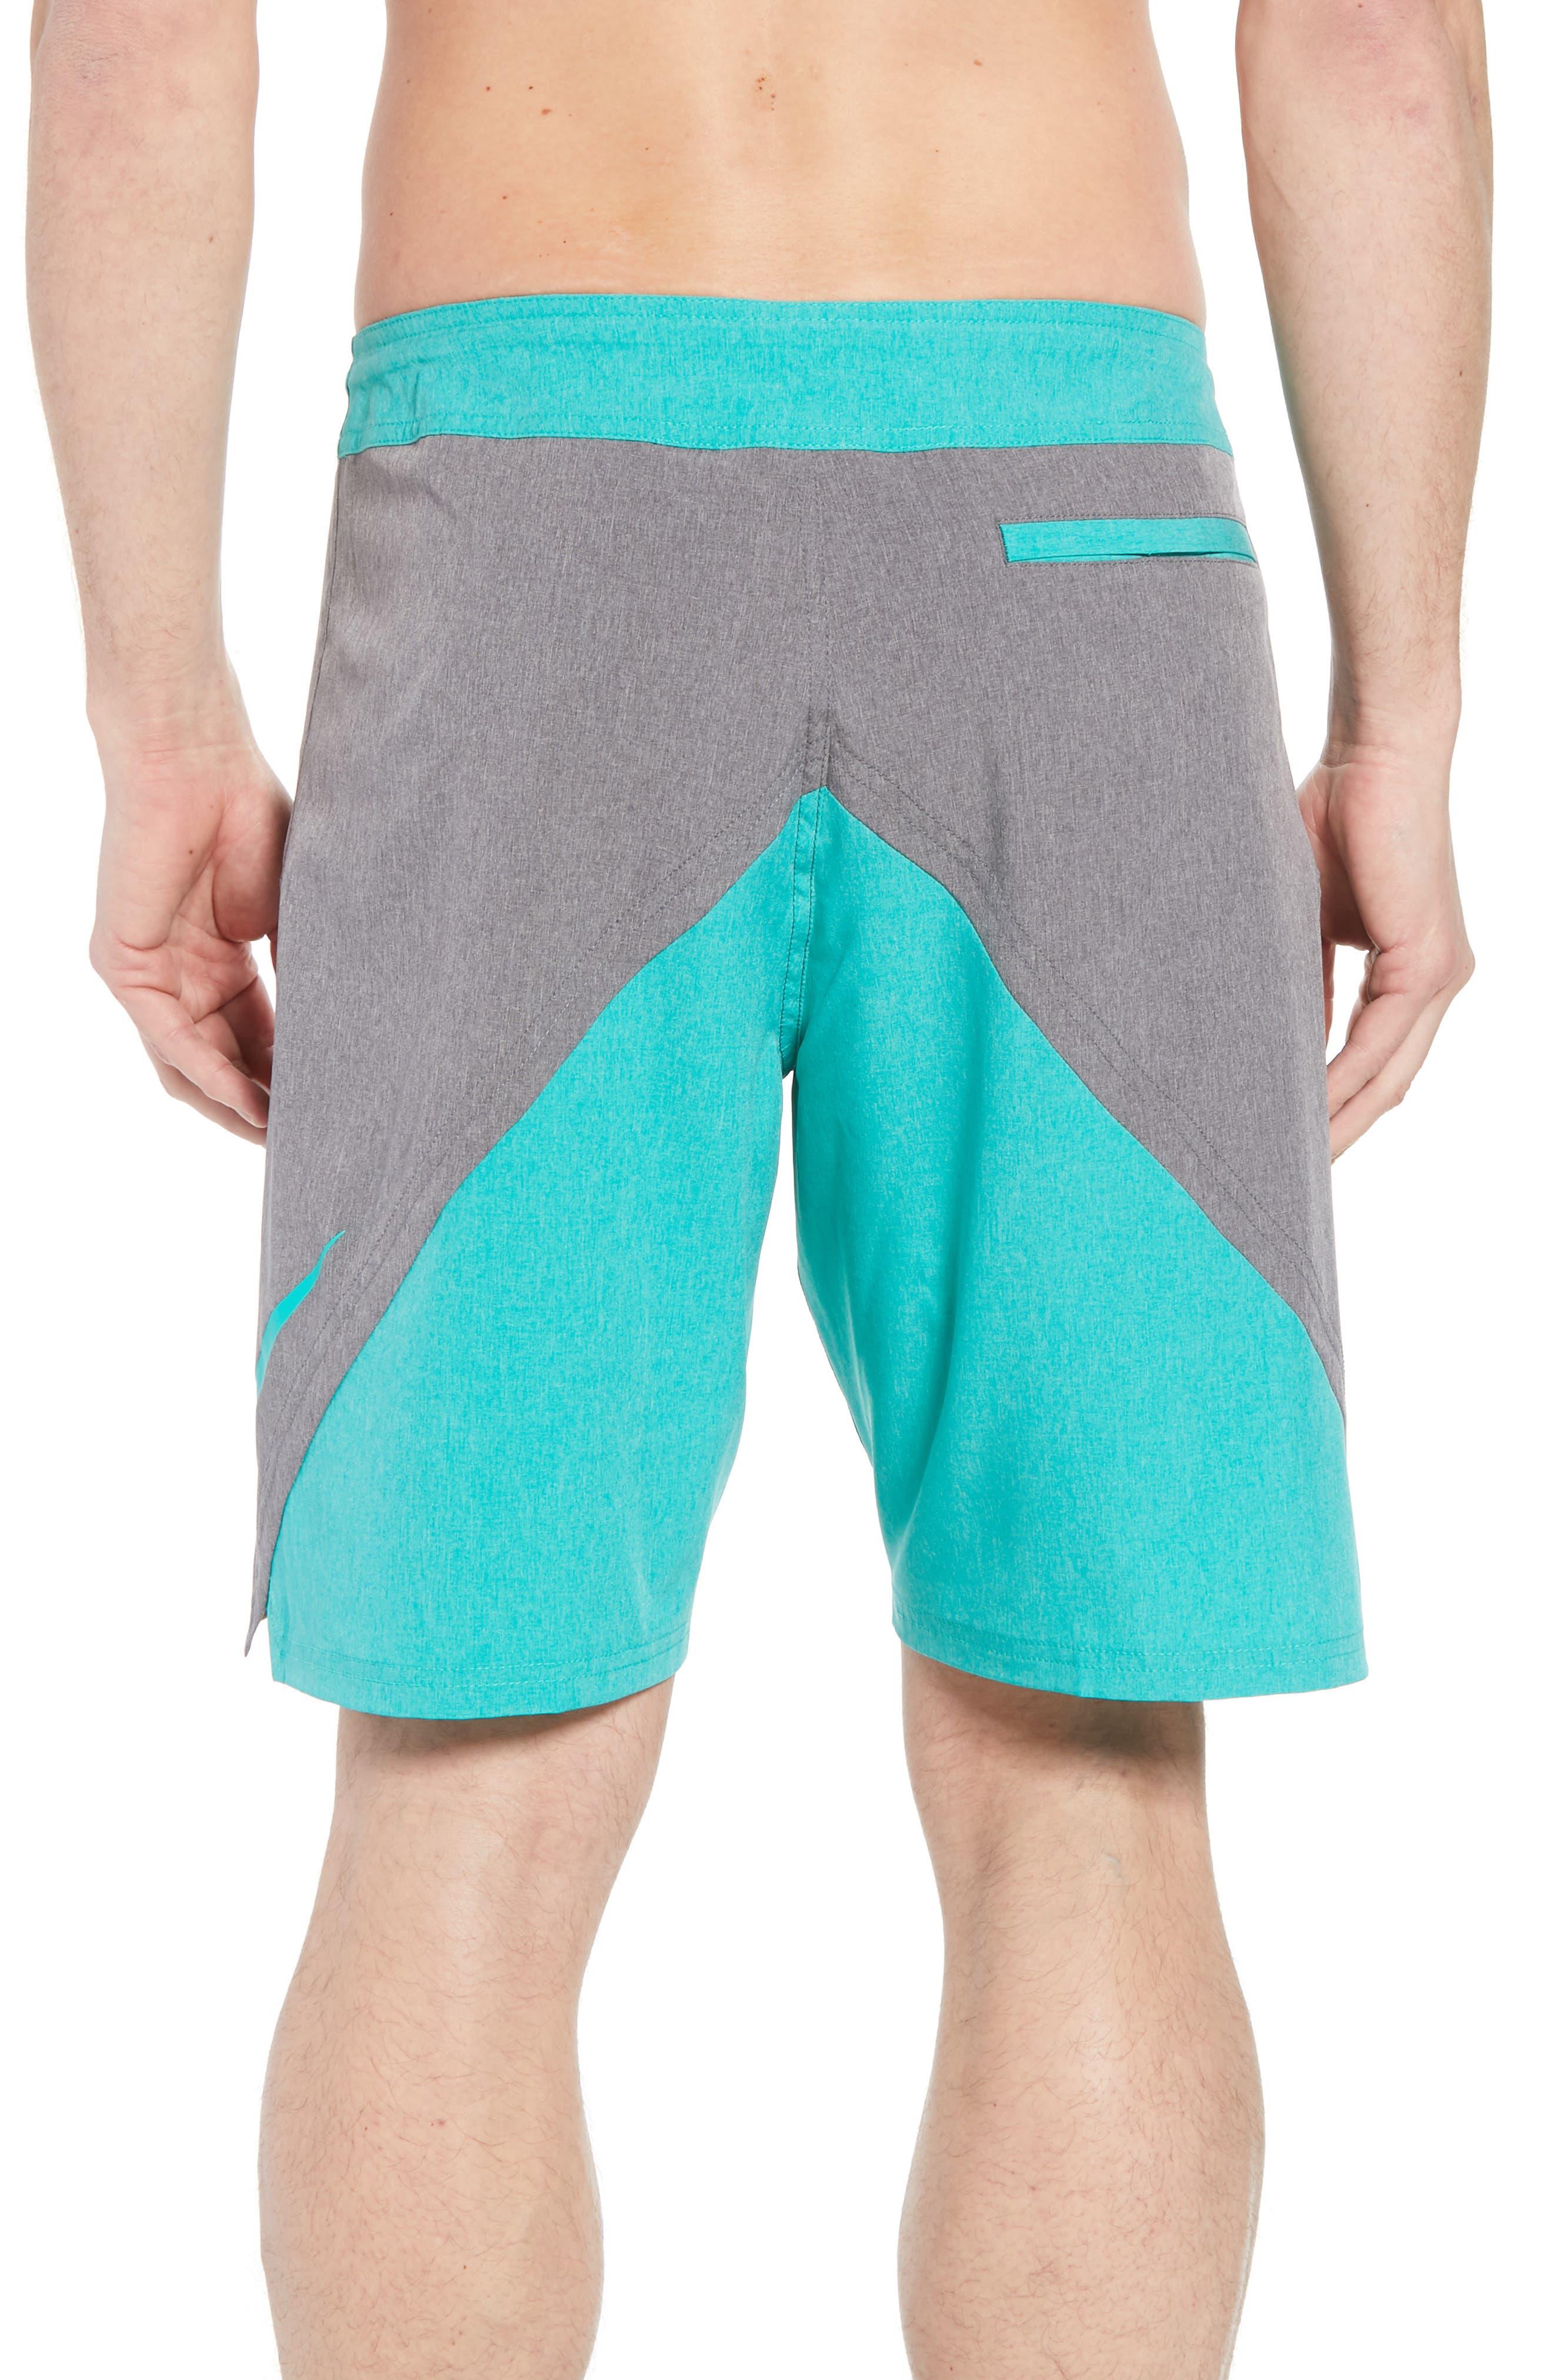 Vortex Board Shorts,                             Alternate thumbnail 2, color,                             Obsidian